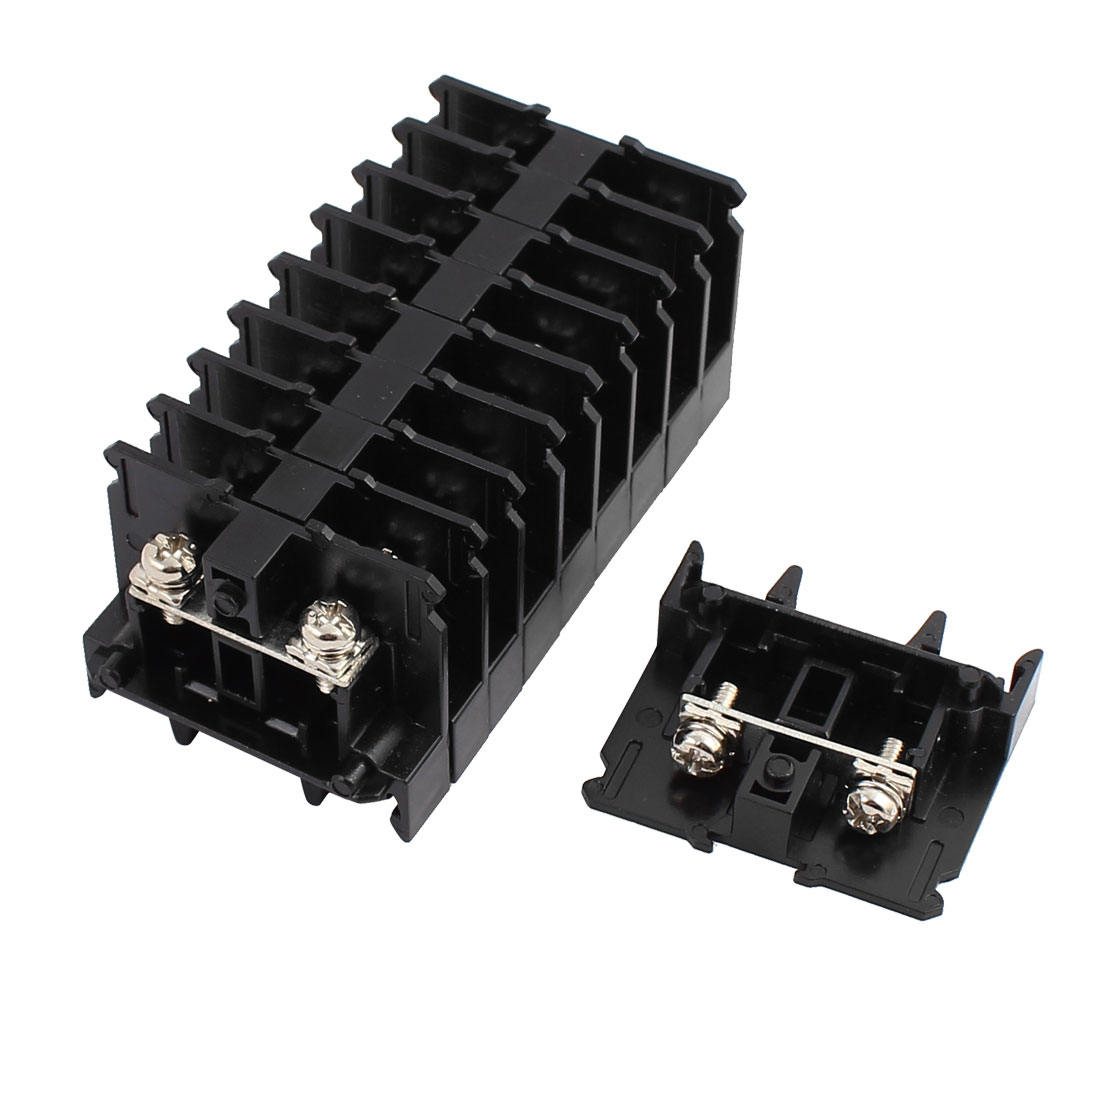 10 Pcs SN-15 600V 10A 2mm2 Screw Clamp Contact Din Rail Terminal Block